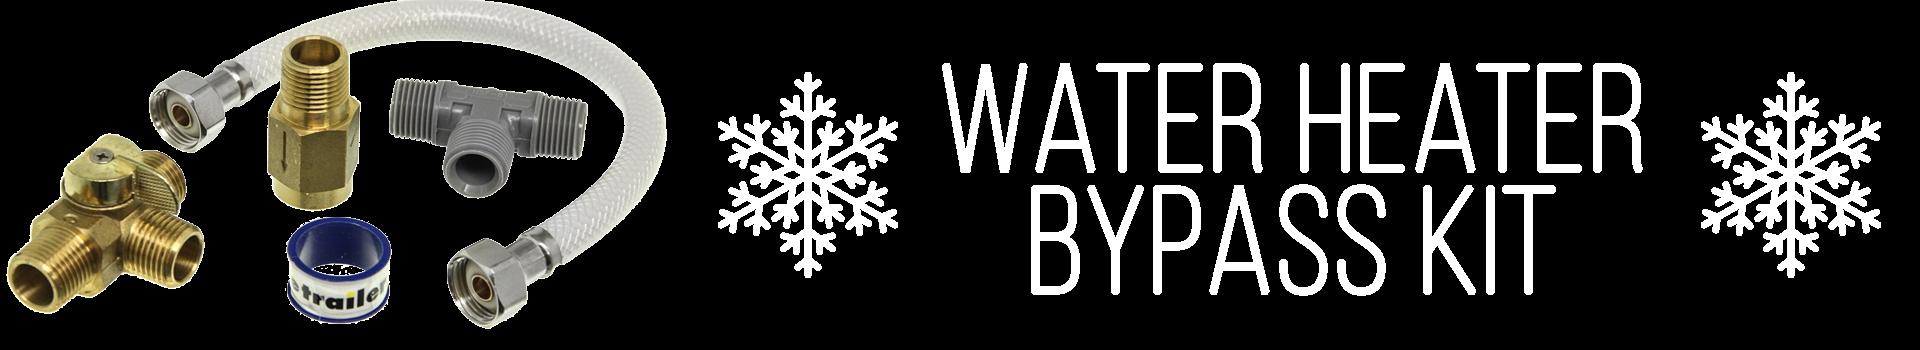 water heater bypass kit